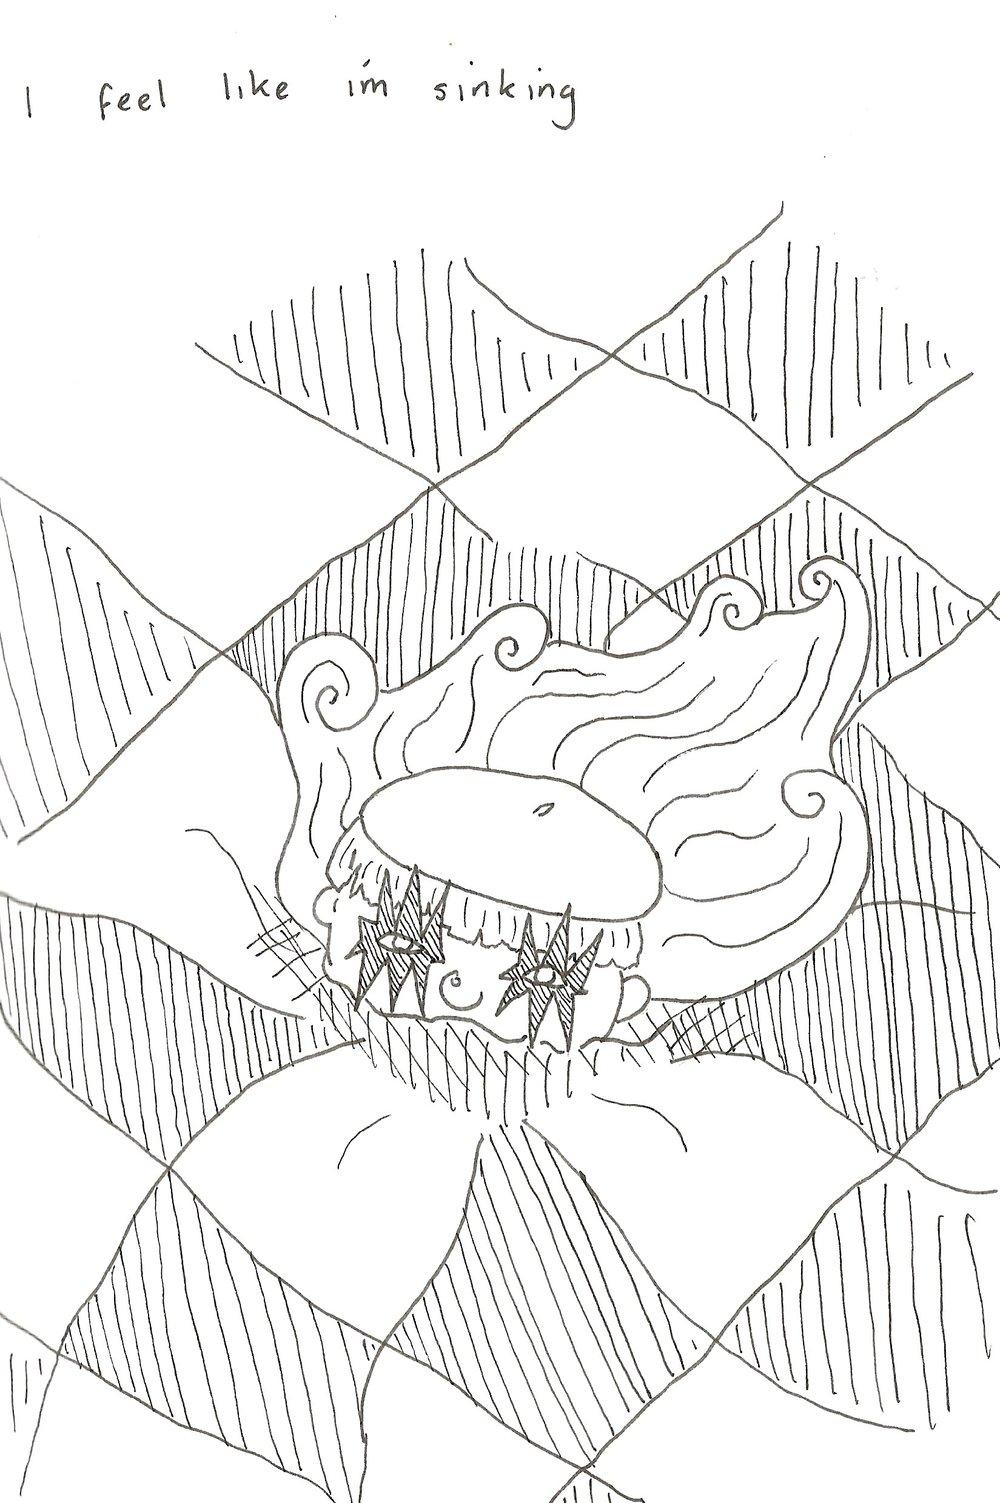 Image of 'Venom' zine